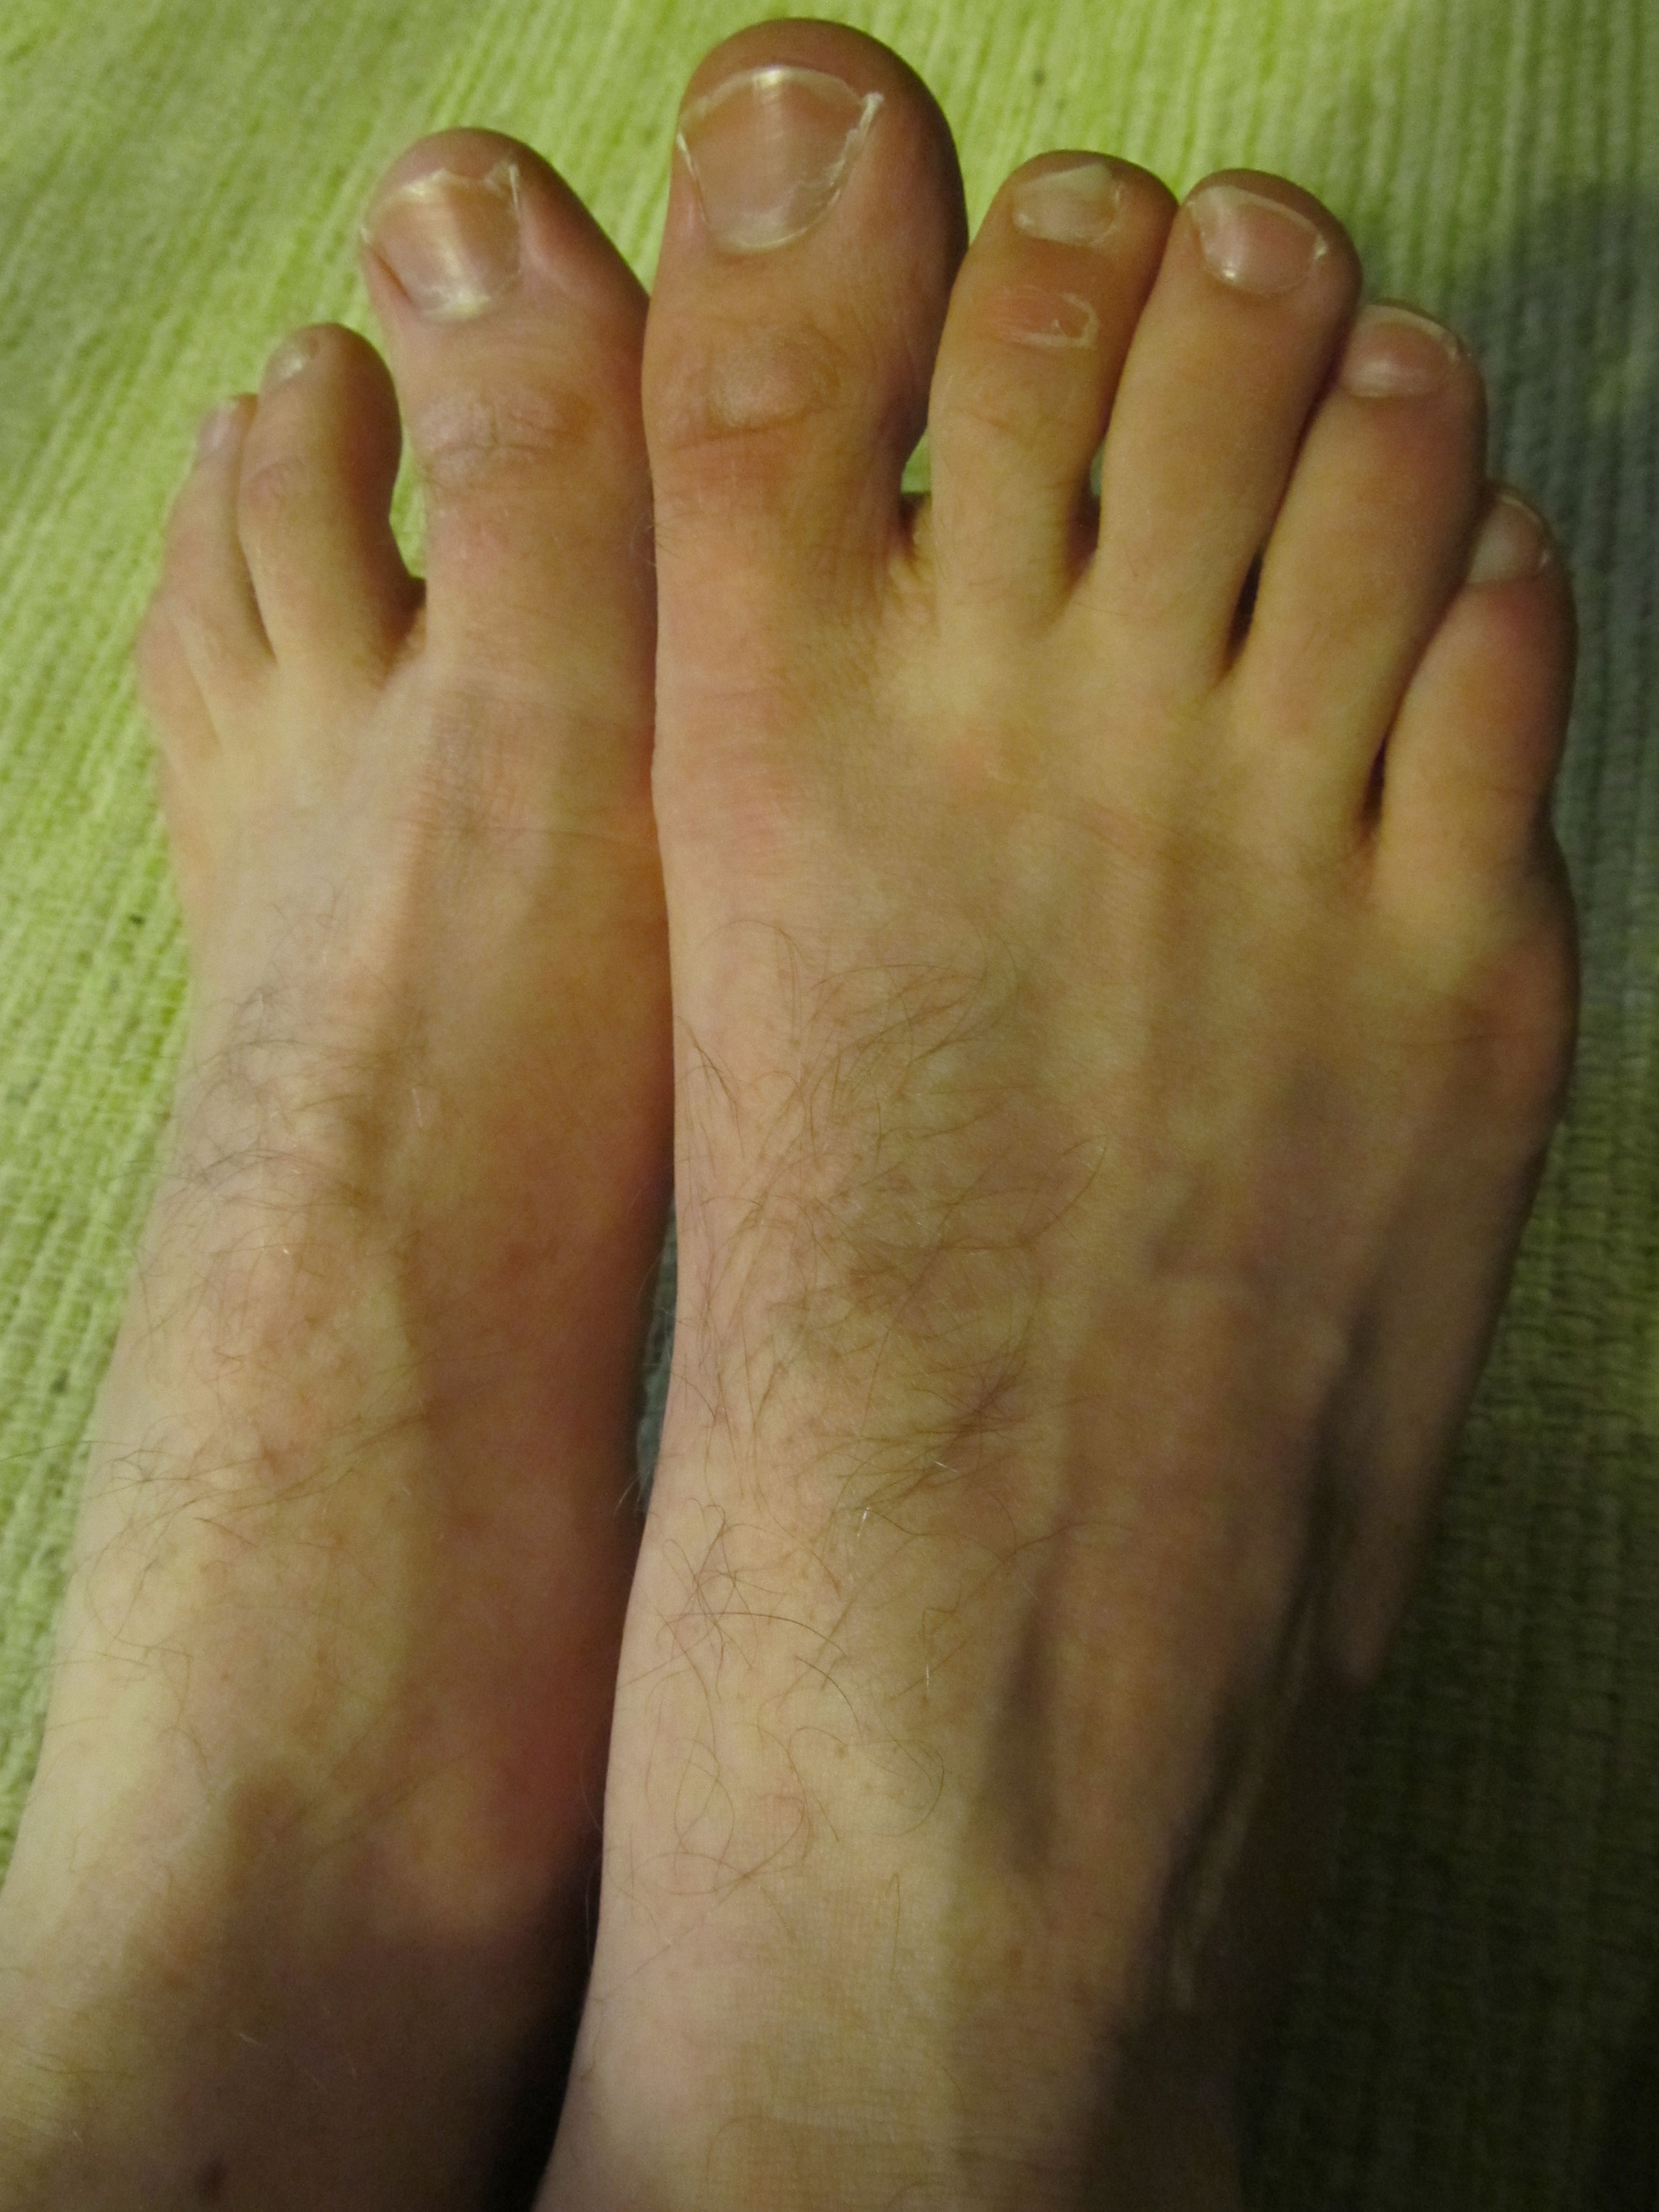 Day 171: Make my feet pretty | Novice Du Jour